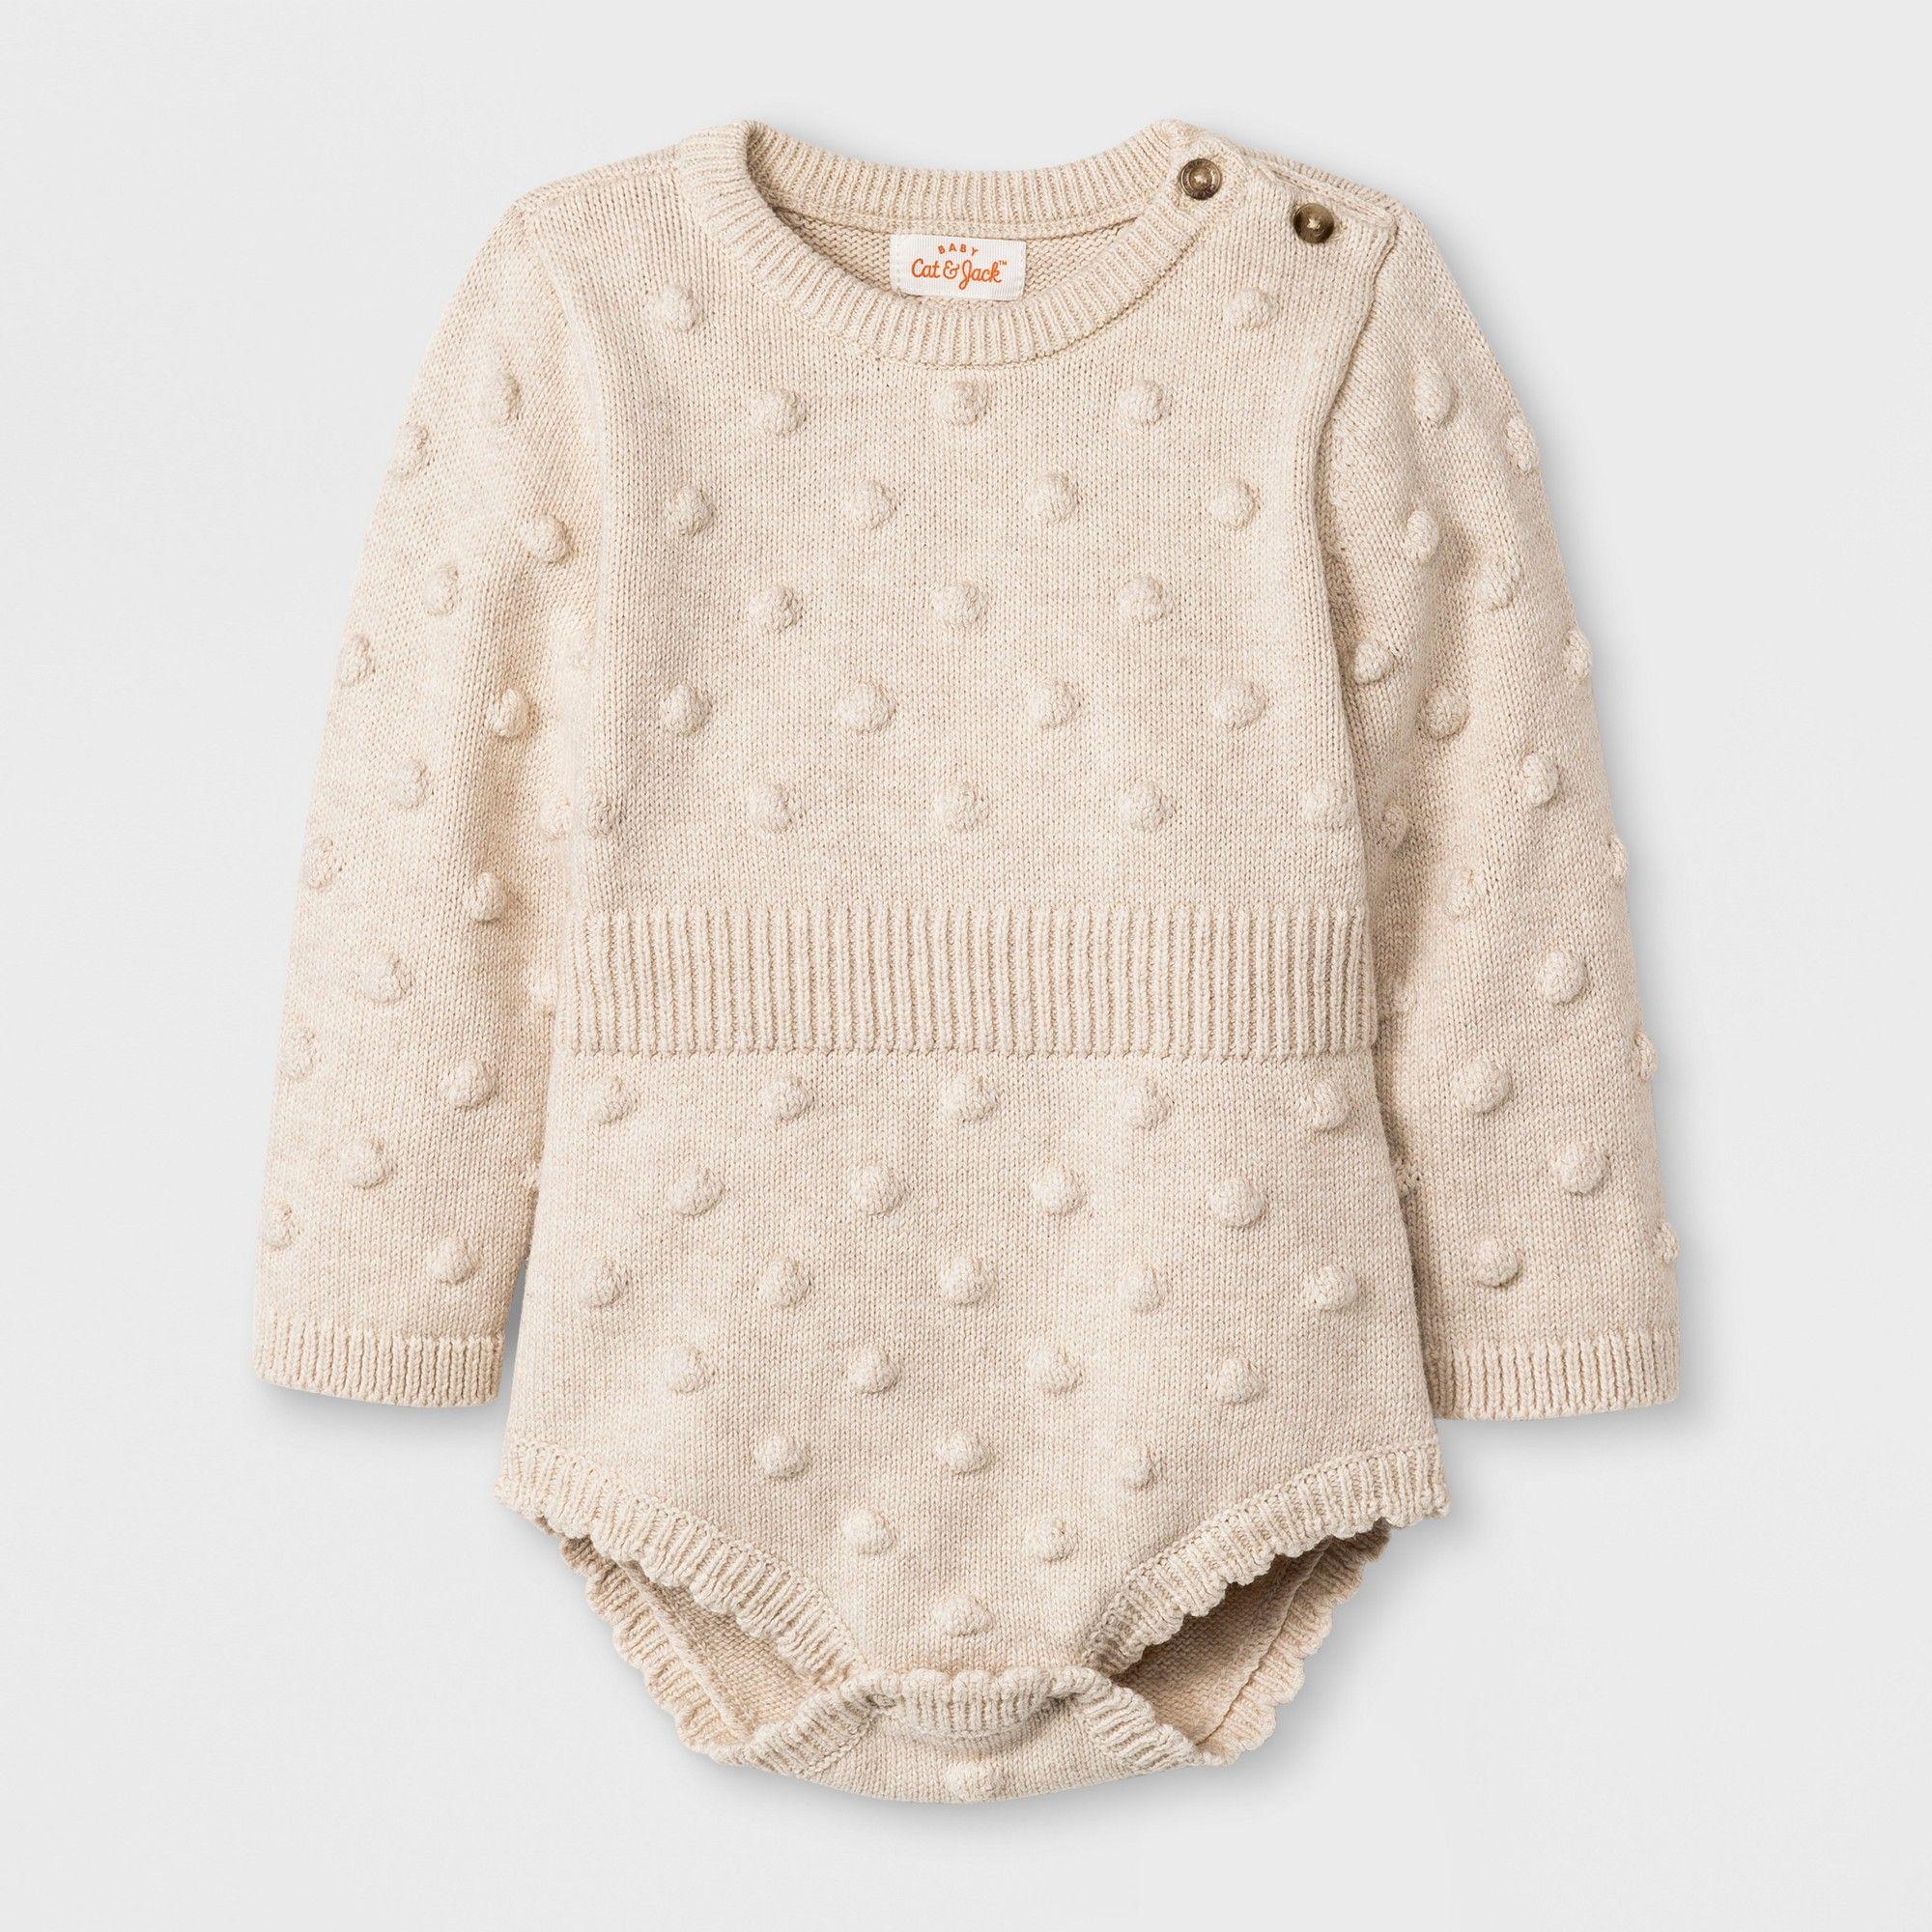 aeecee32291b Baby Girls  Long Sleeve Legless Romper Sweater - Cat   Jack Beige ...